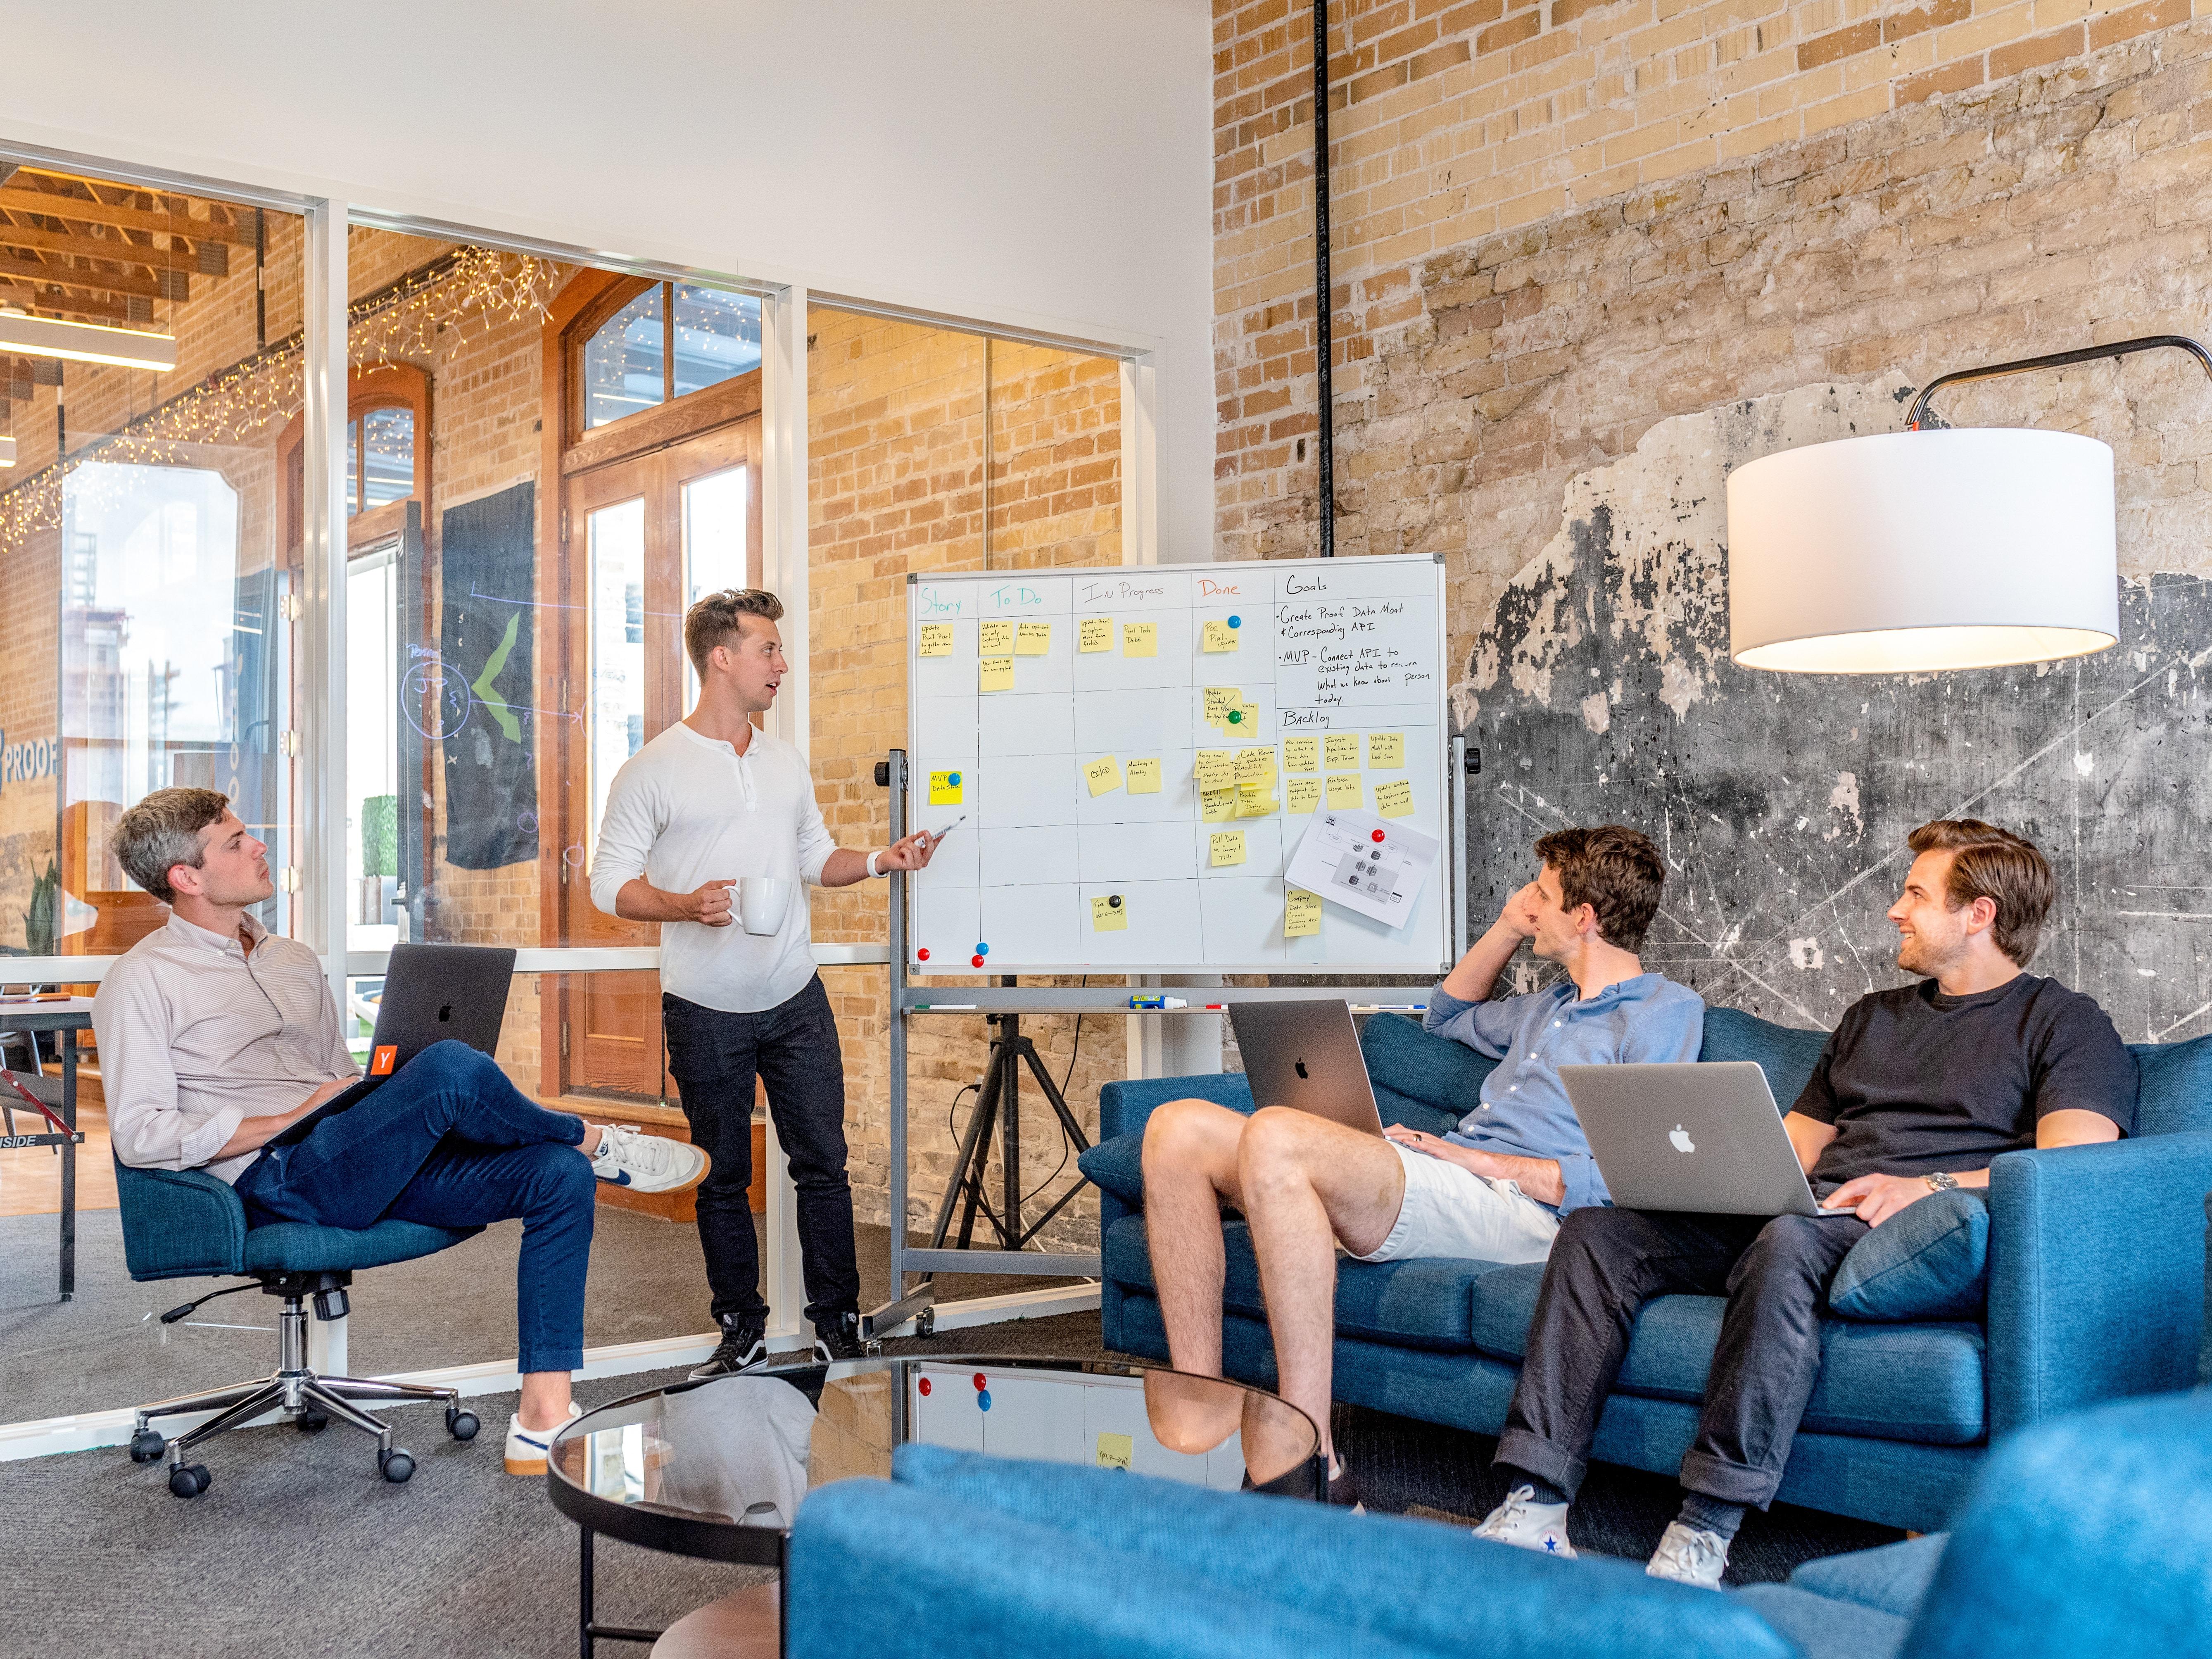 Equipe Discutindo Estilos De Liderança Na Tech Journey